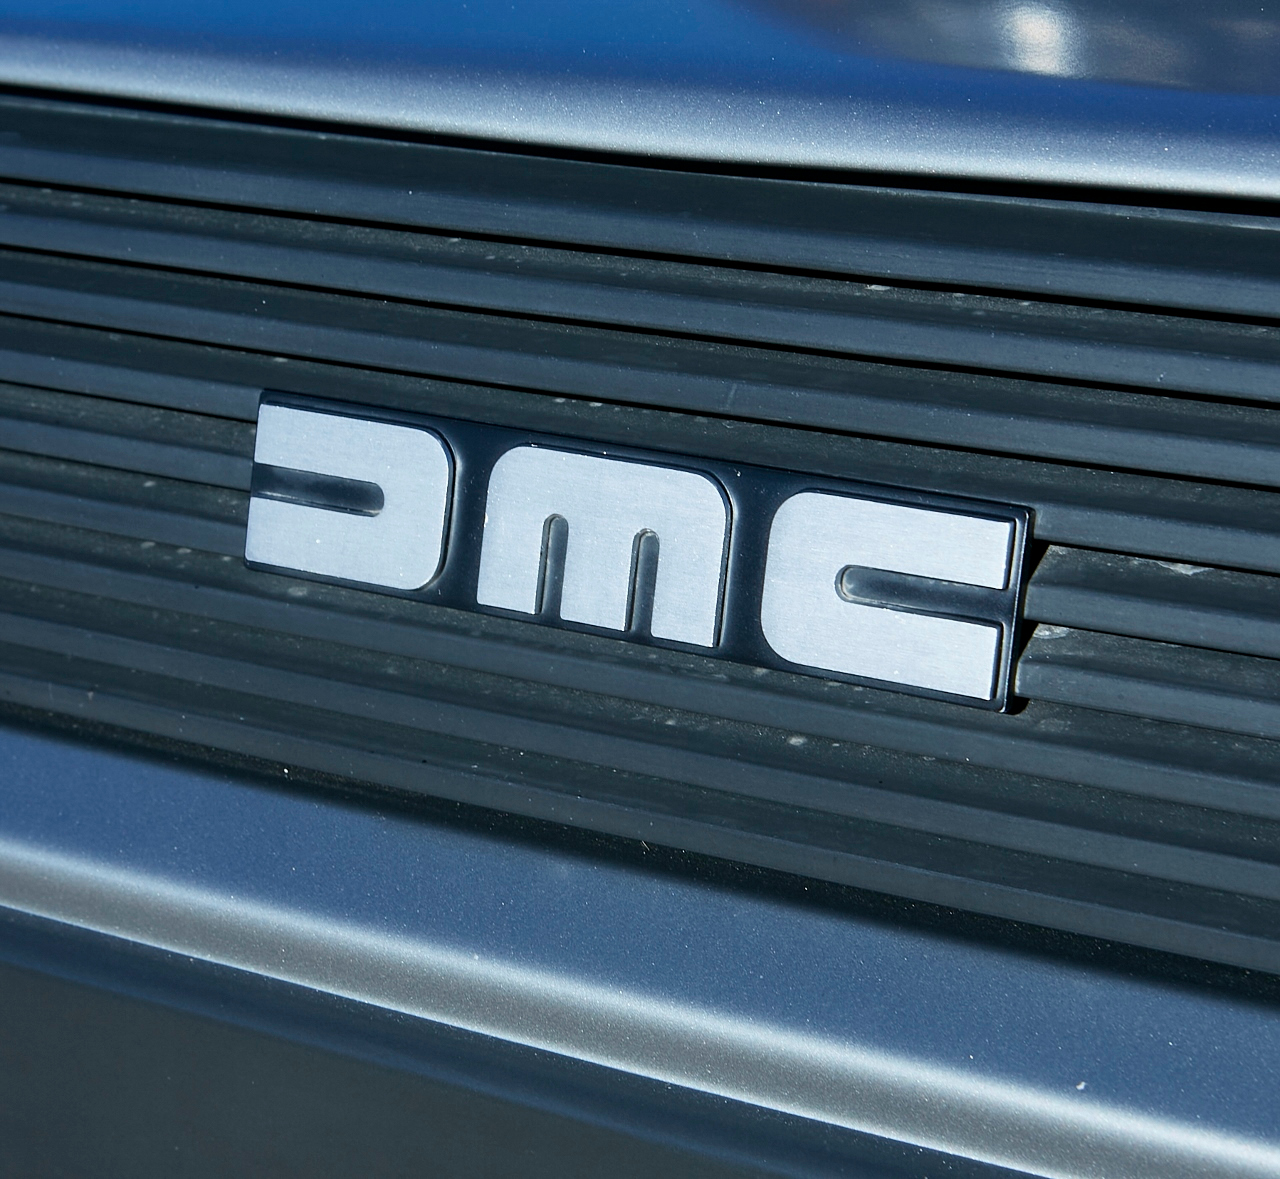 1981 DeLorean DMC-12 5-Speed grille emblem